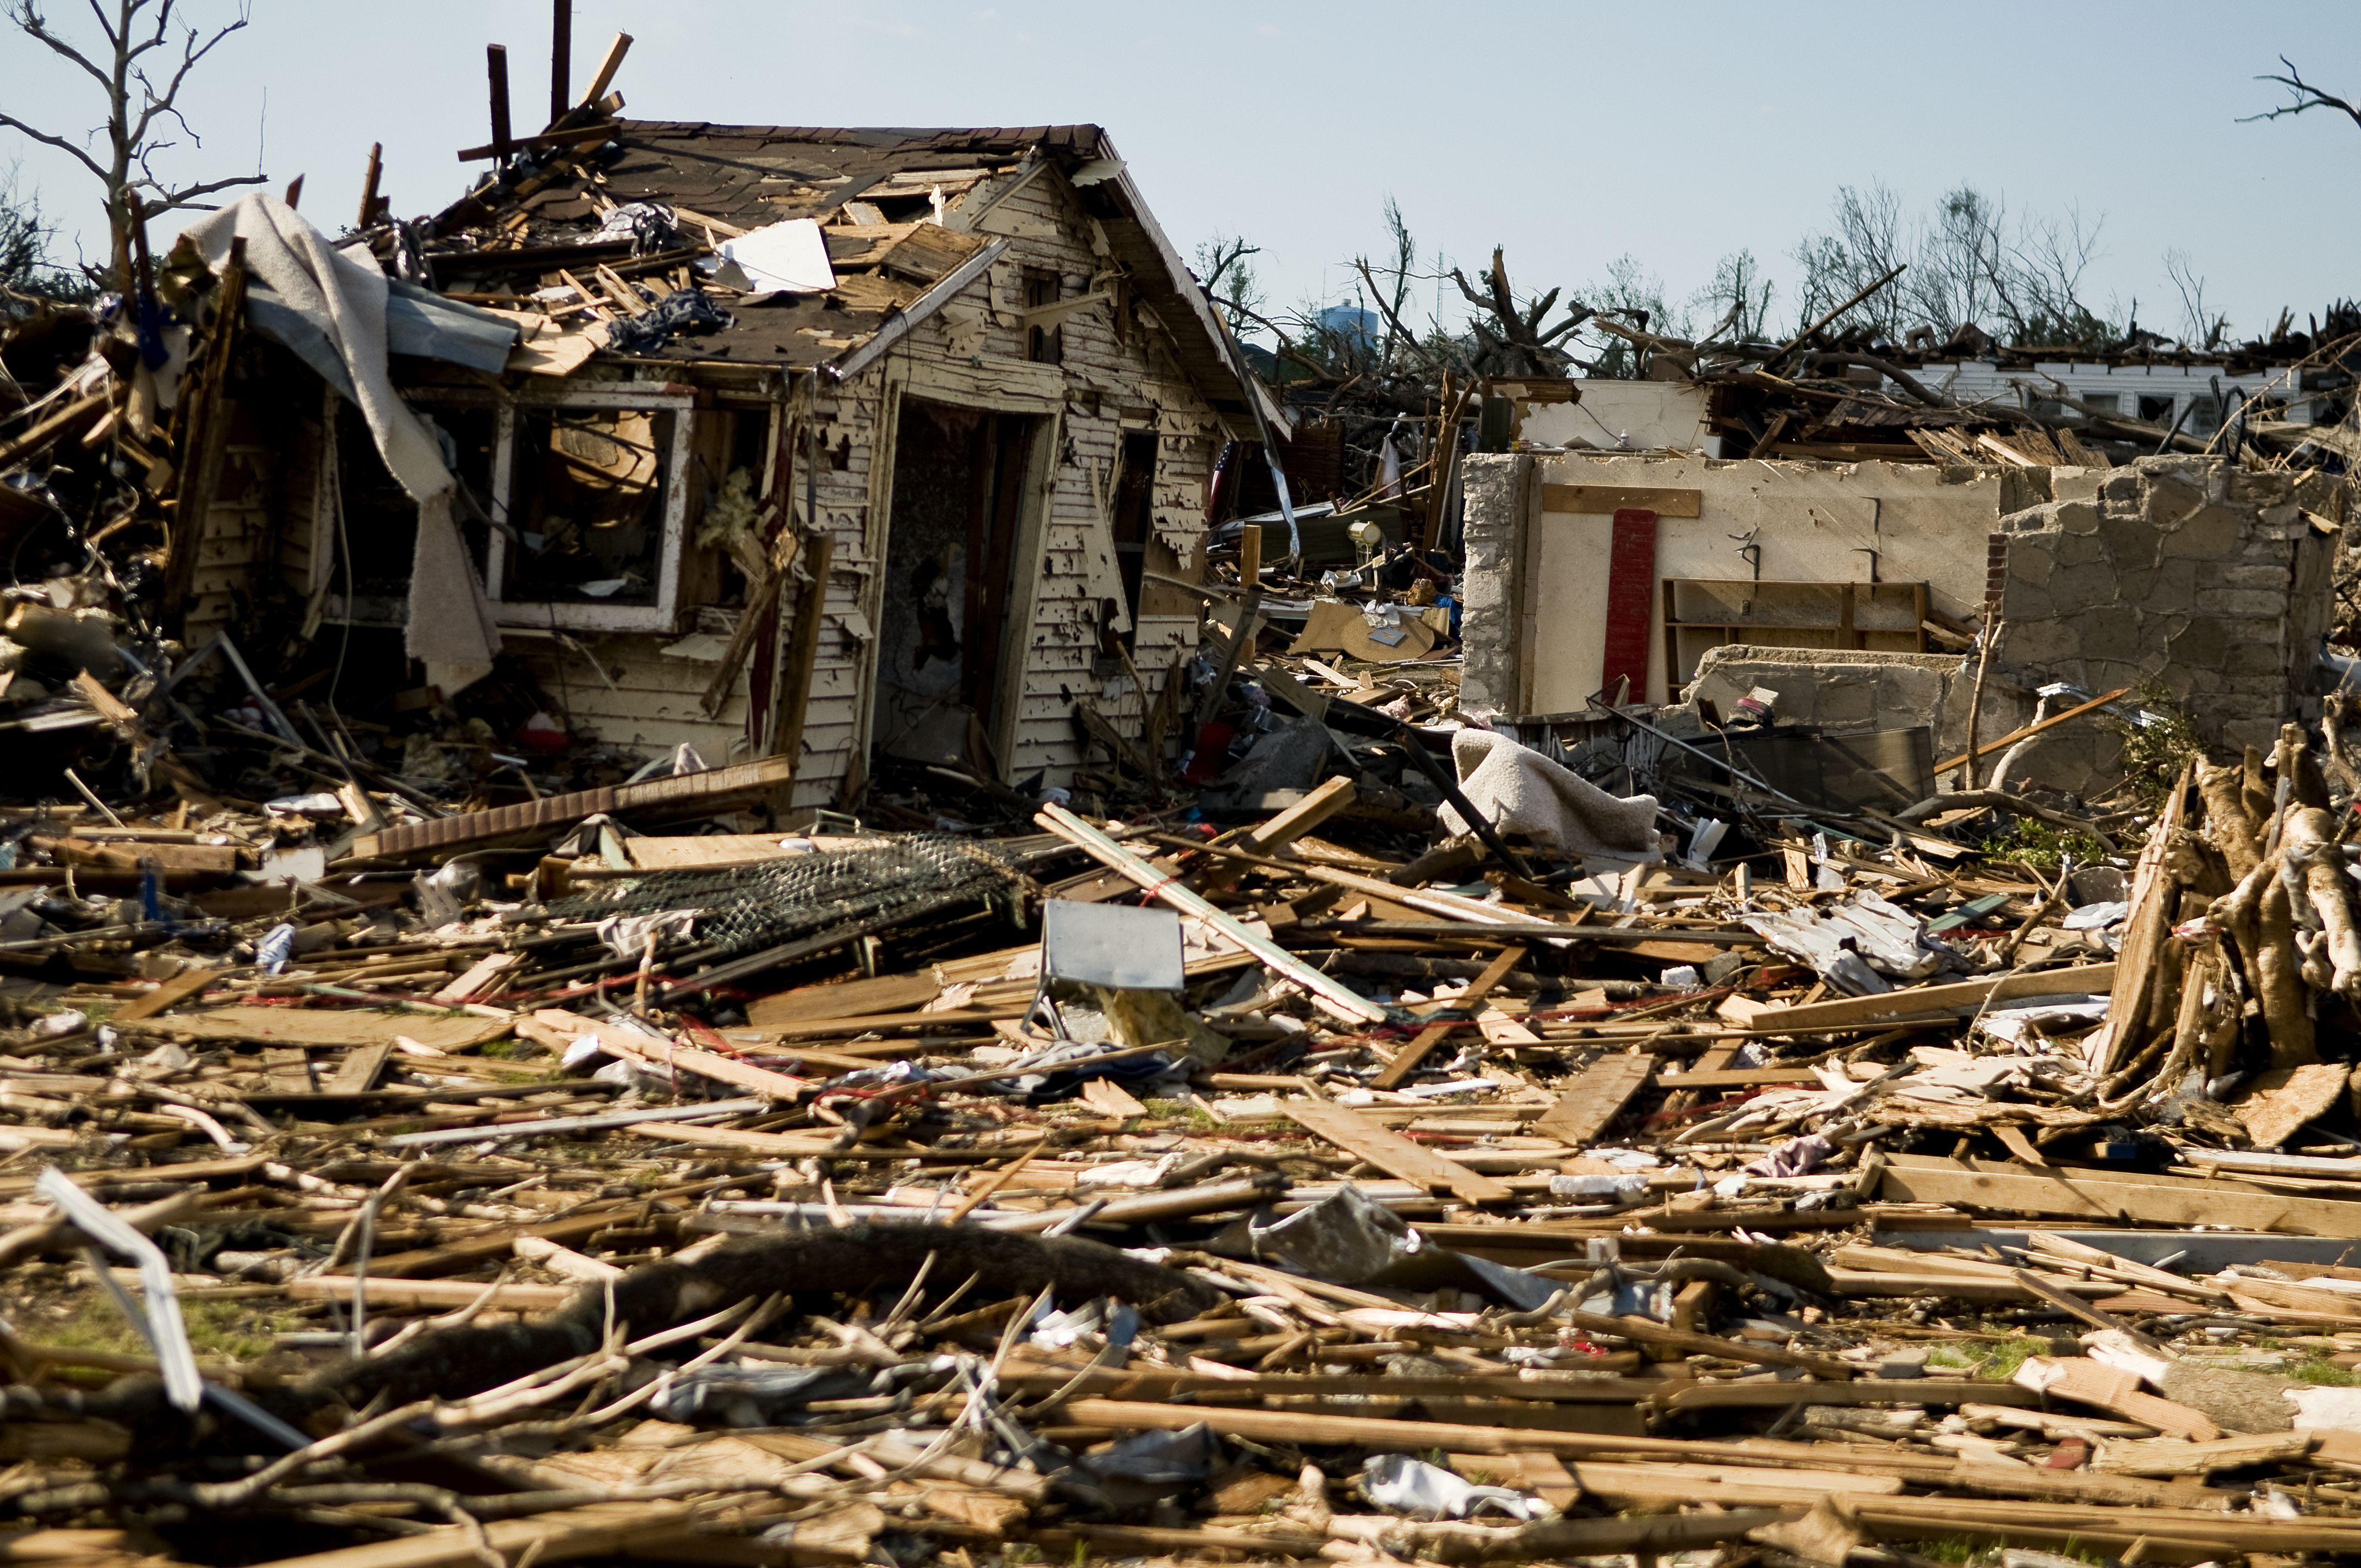 Devastation The Tornado Left So Much Devastation That People